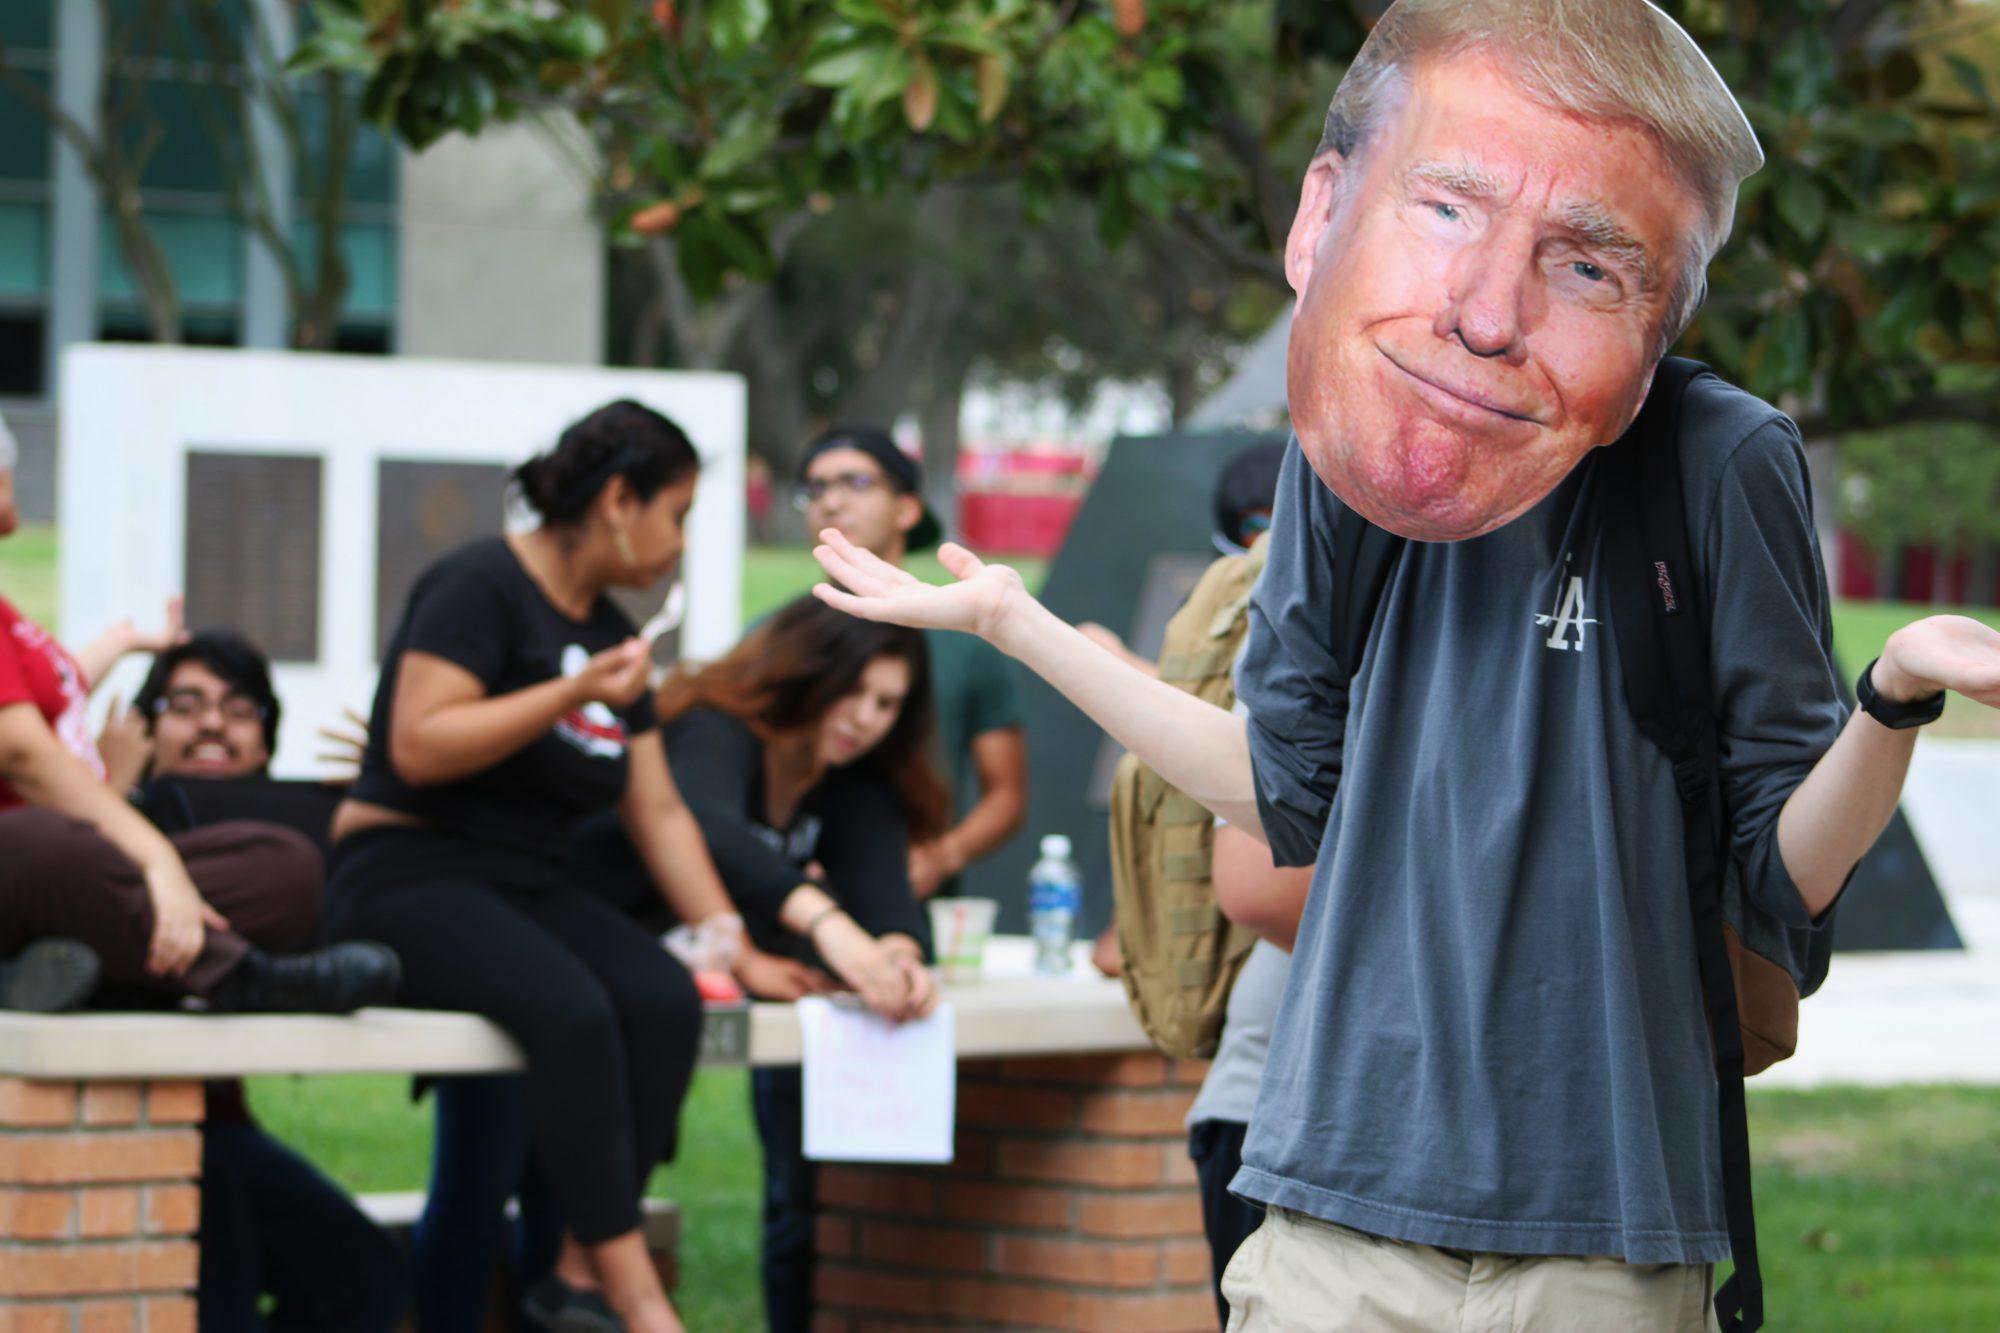 Anti-Trump+students+counter+protest.